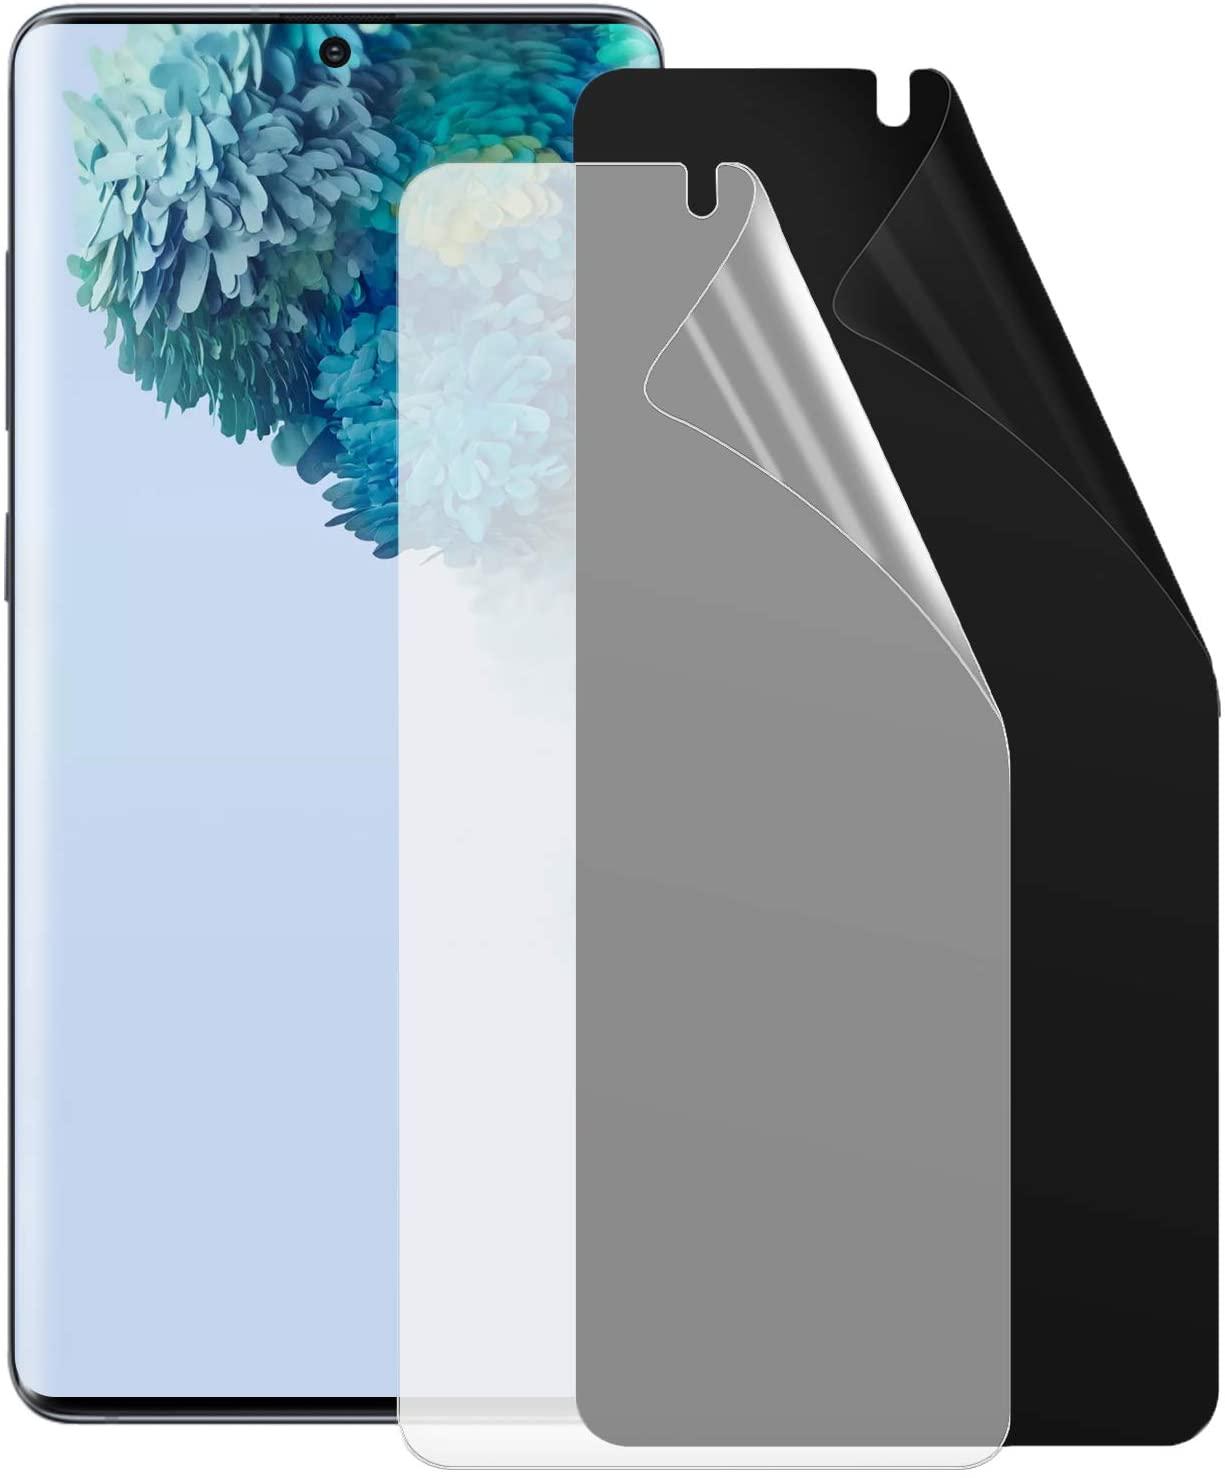 LELANG Galaxy S20 Privacy Screen Protector, [2 Pack] [Anti-spy] [Darken Screen] [Fingerprint Unlock] [High Definition] TPU Protective Film for Samsung Galaxy S20 (S20 5G, 6.2 inch)